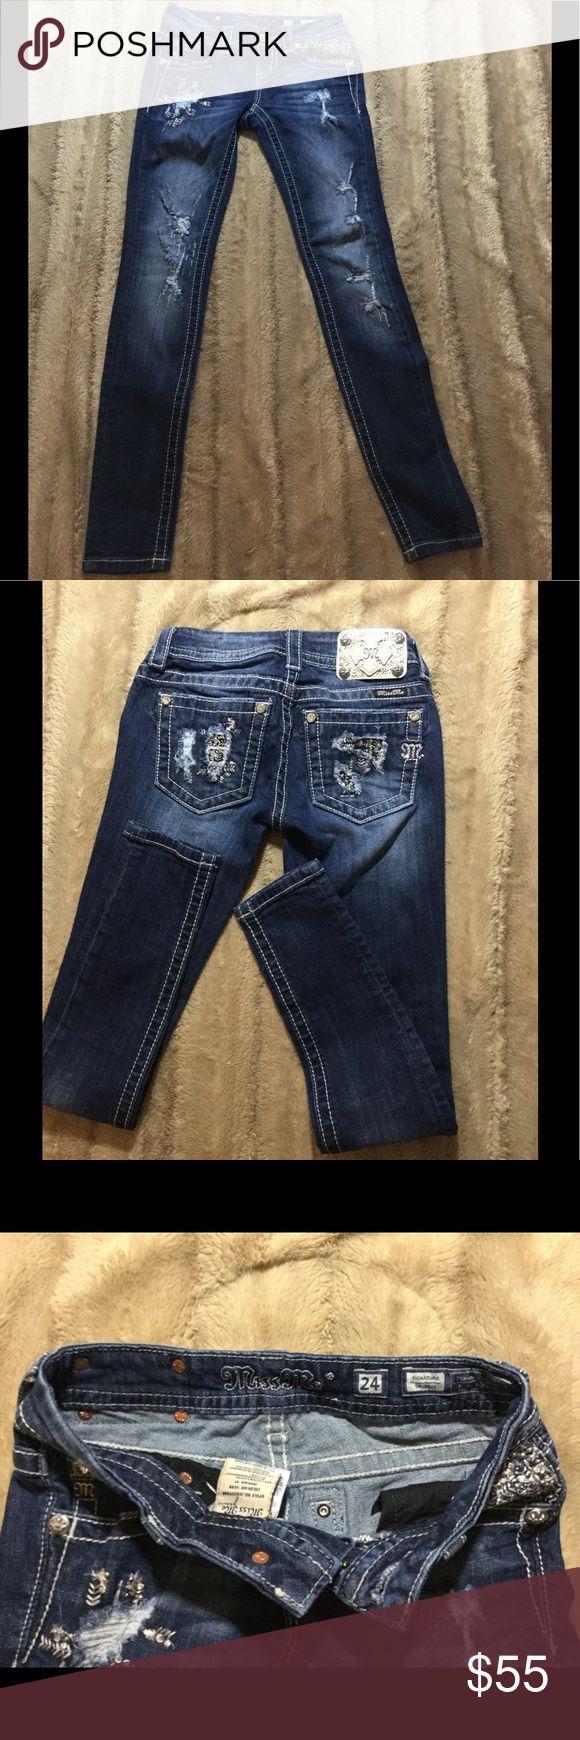 Selling this Miss Me. Rhinestone embellished distressed jean on Poshmark! My username is: tinybrowncow. #shopmycloset #poshmark #fashion #shopping #style #forsale #Miss Me #Denim